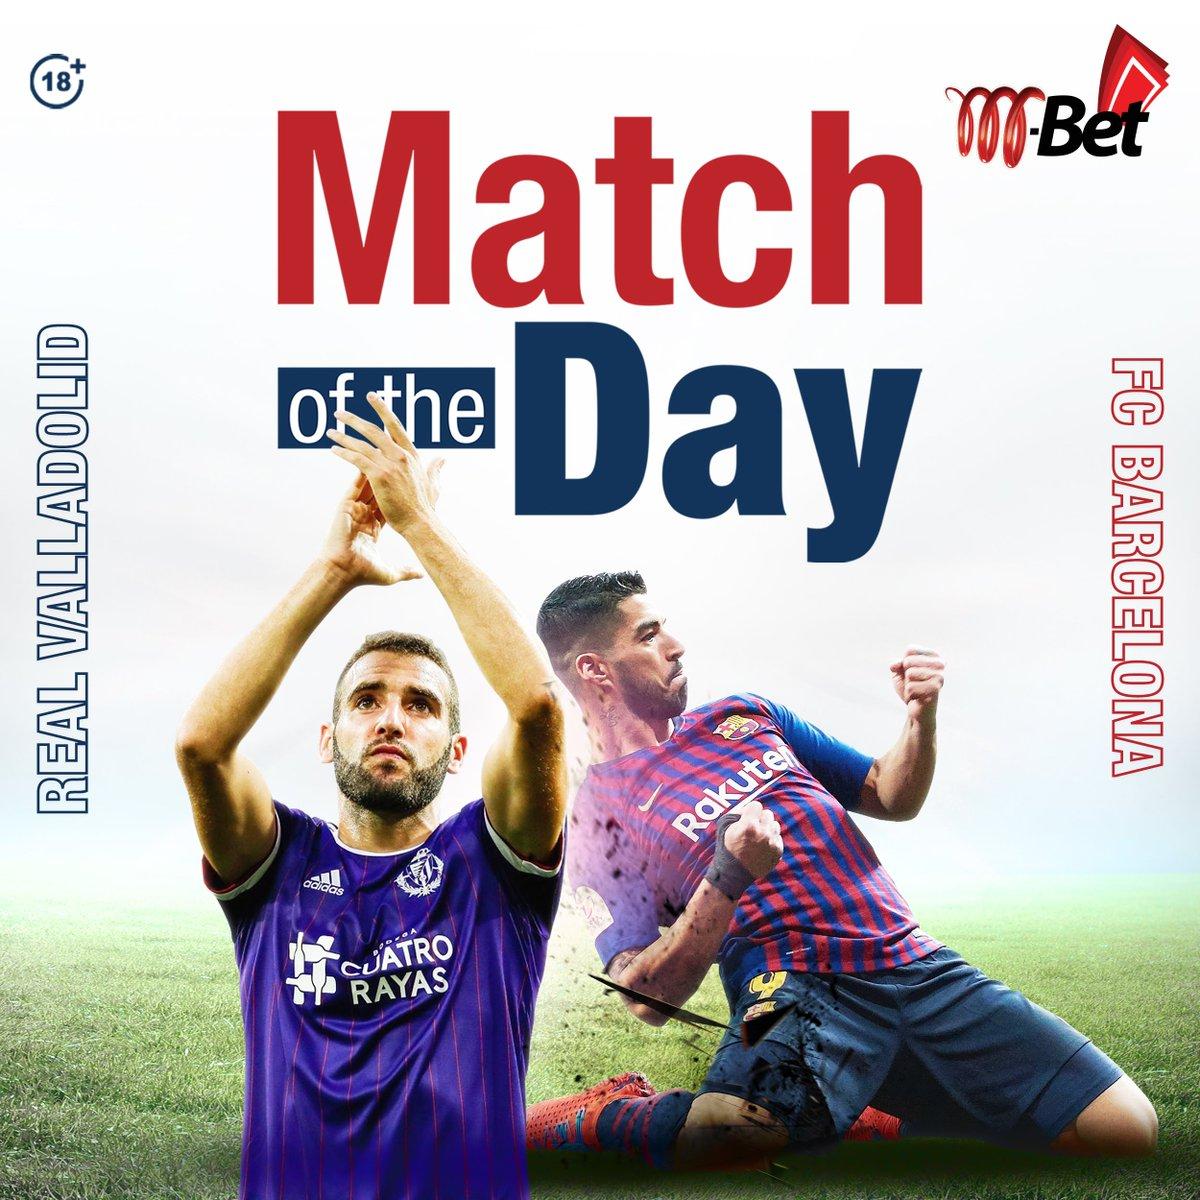 🔥Lionel Messi, Luis Suarez and Antoine Griezmann in attack for Barcelona, itabidi Valladolid wajikaze leo. 👉Wekeza na #MBetPlus ushinde. Bonyeza bit.ly/31xSR1b au Piga *798*8#